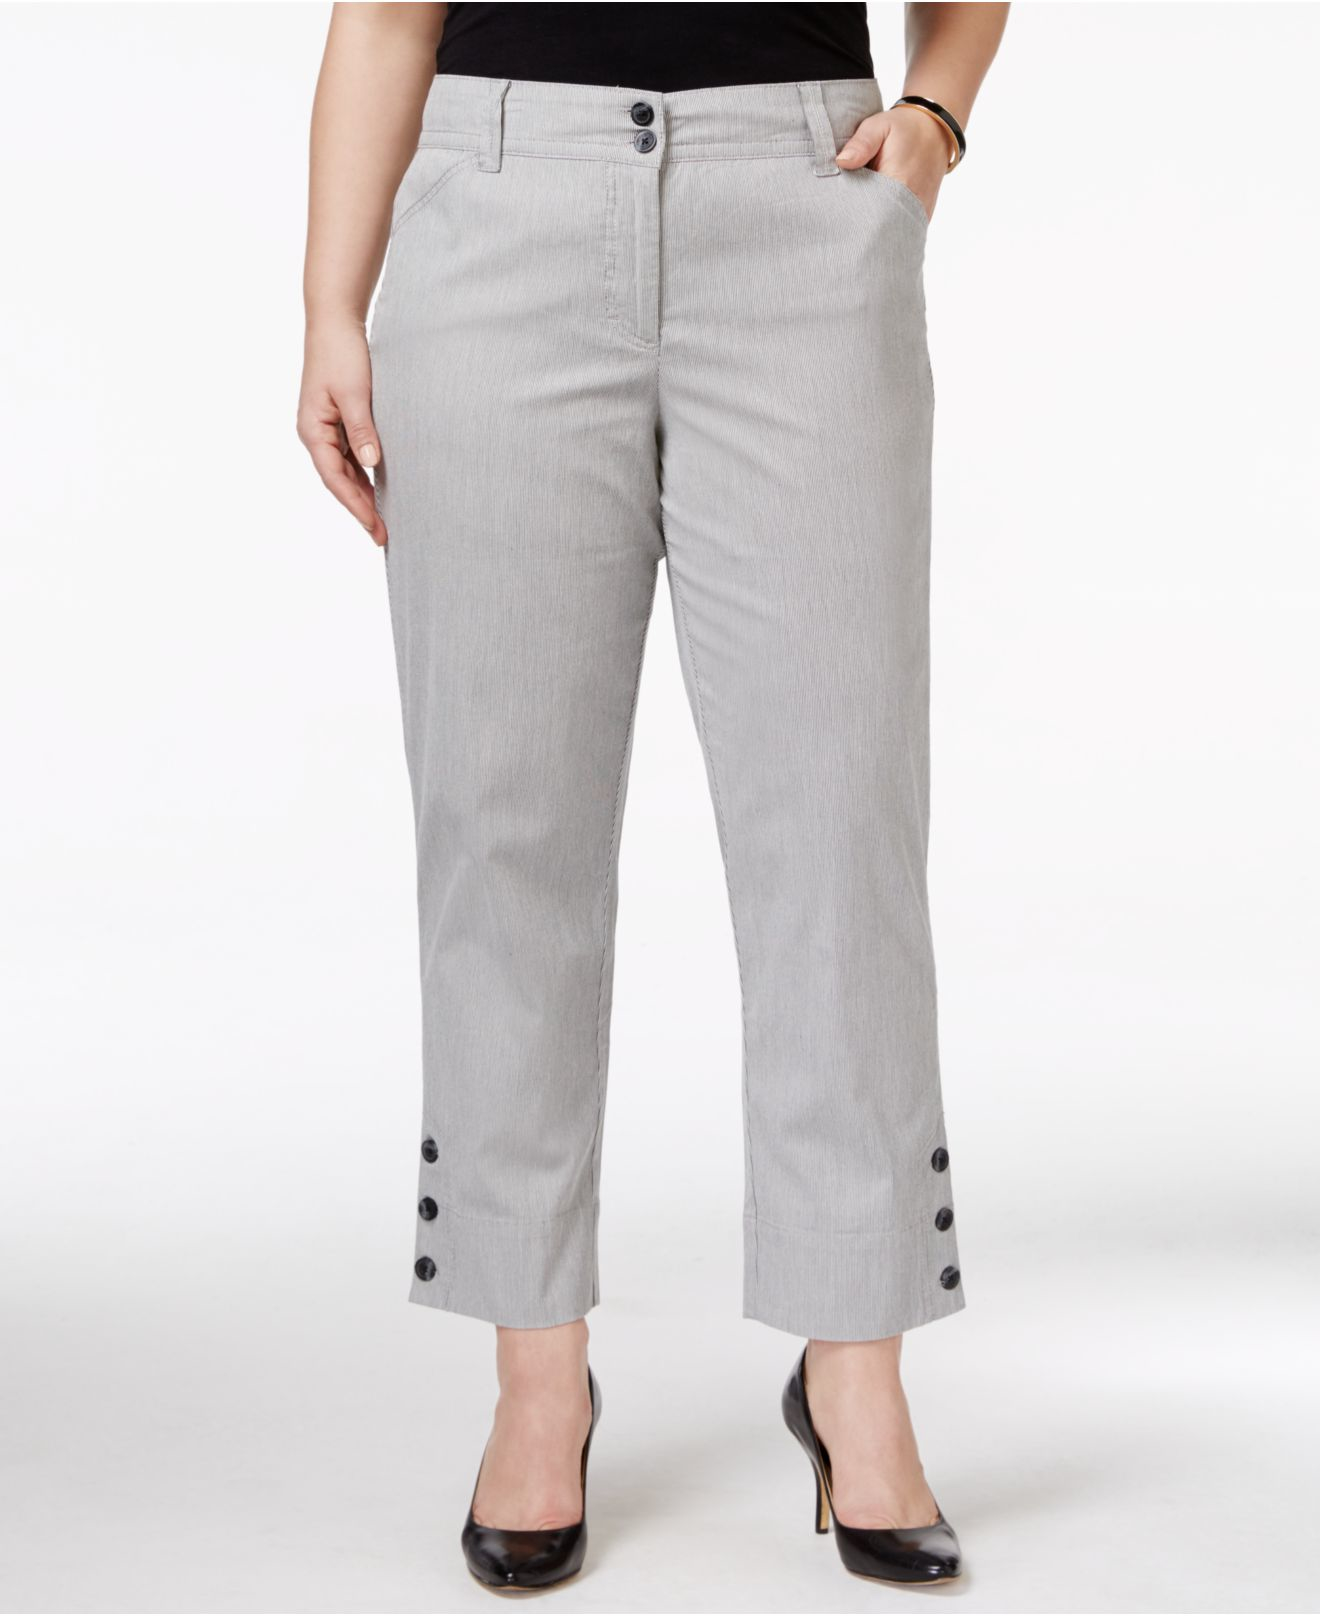 Mens Jeans 35 Waist